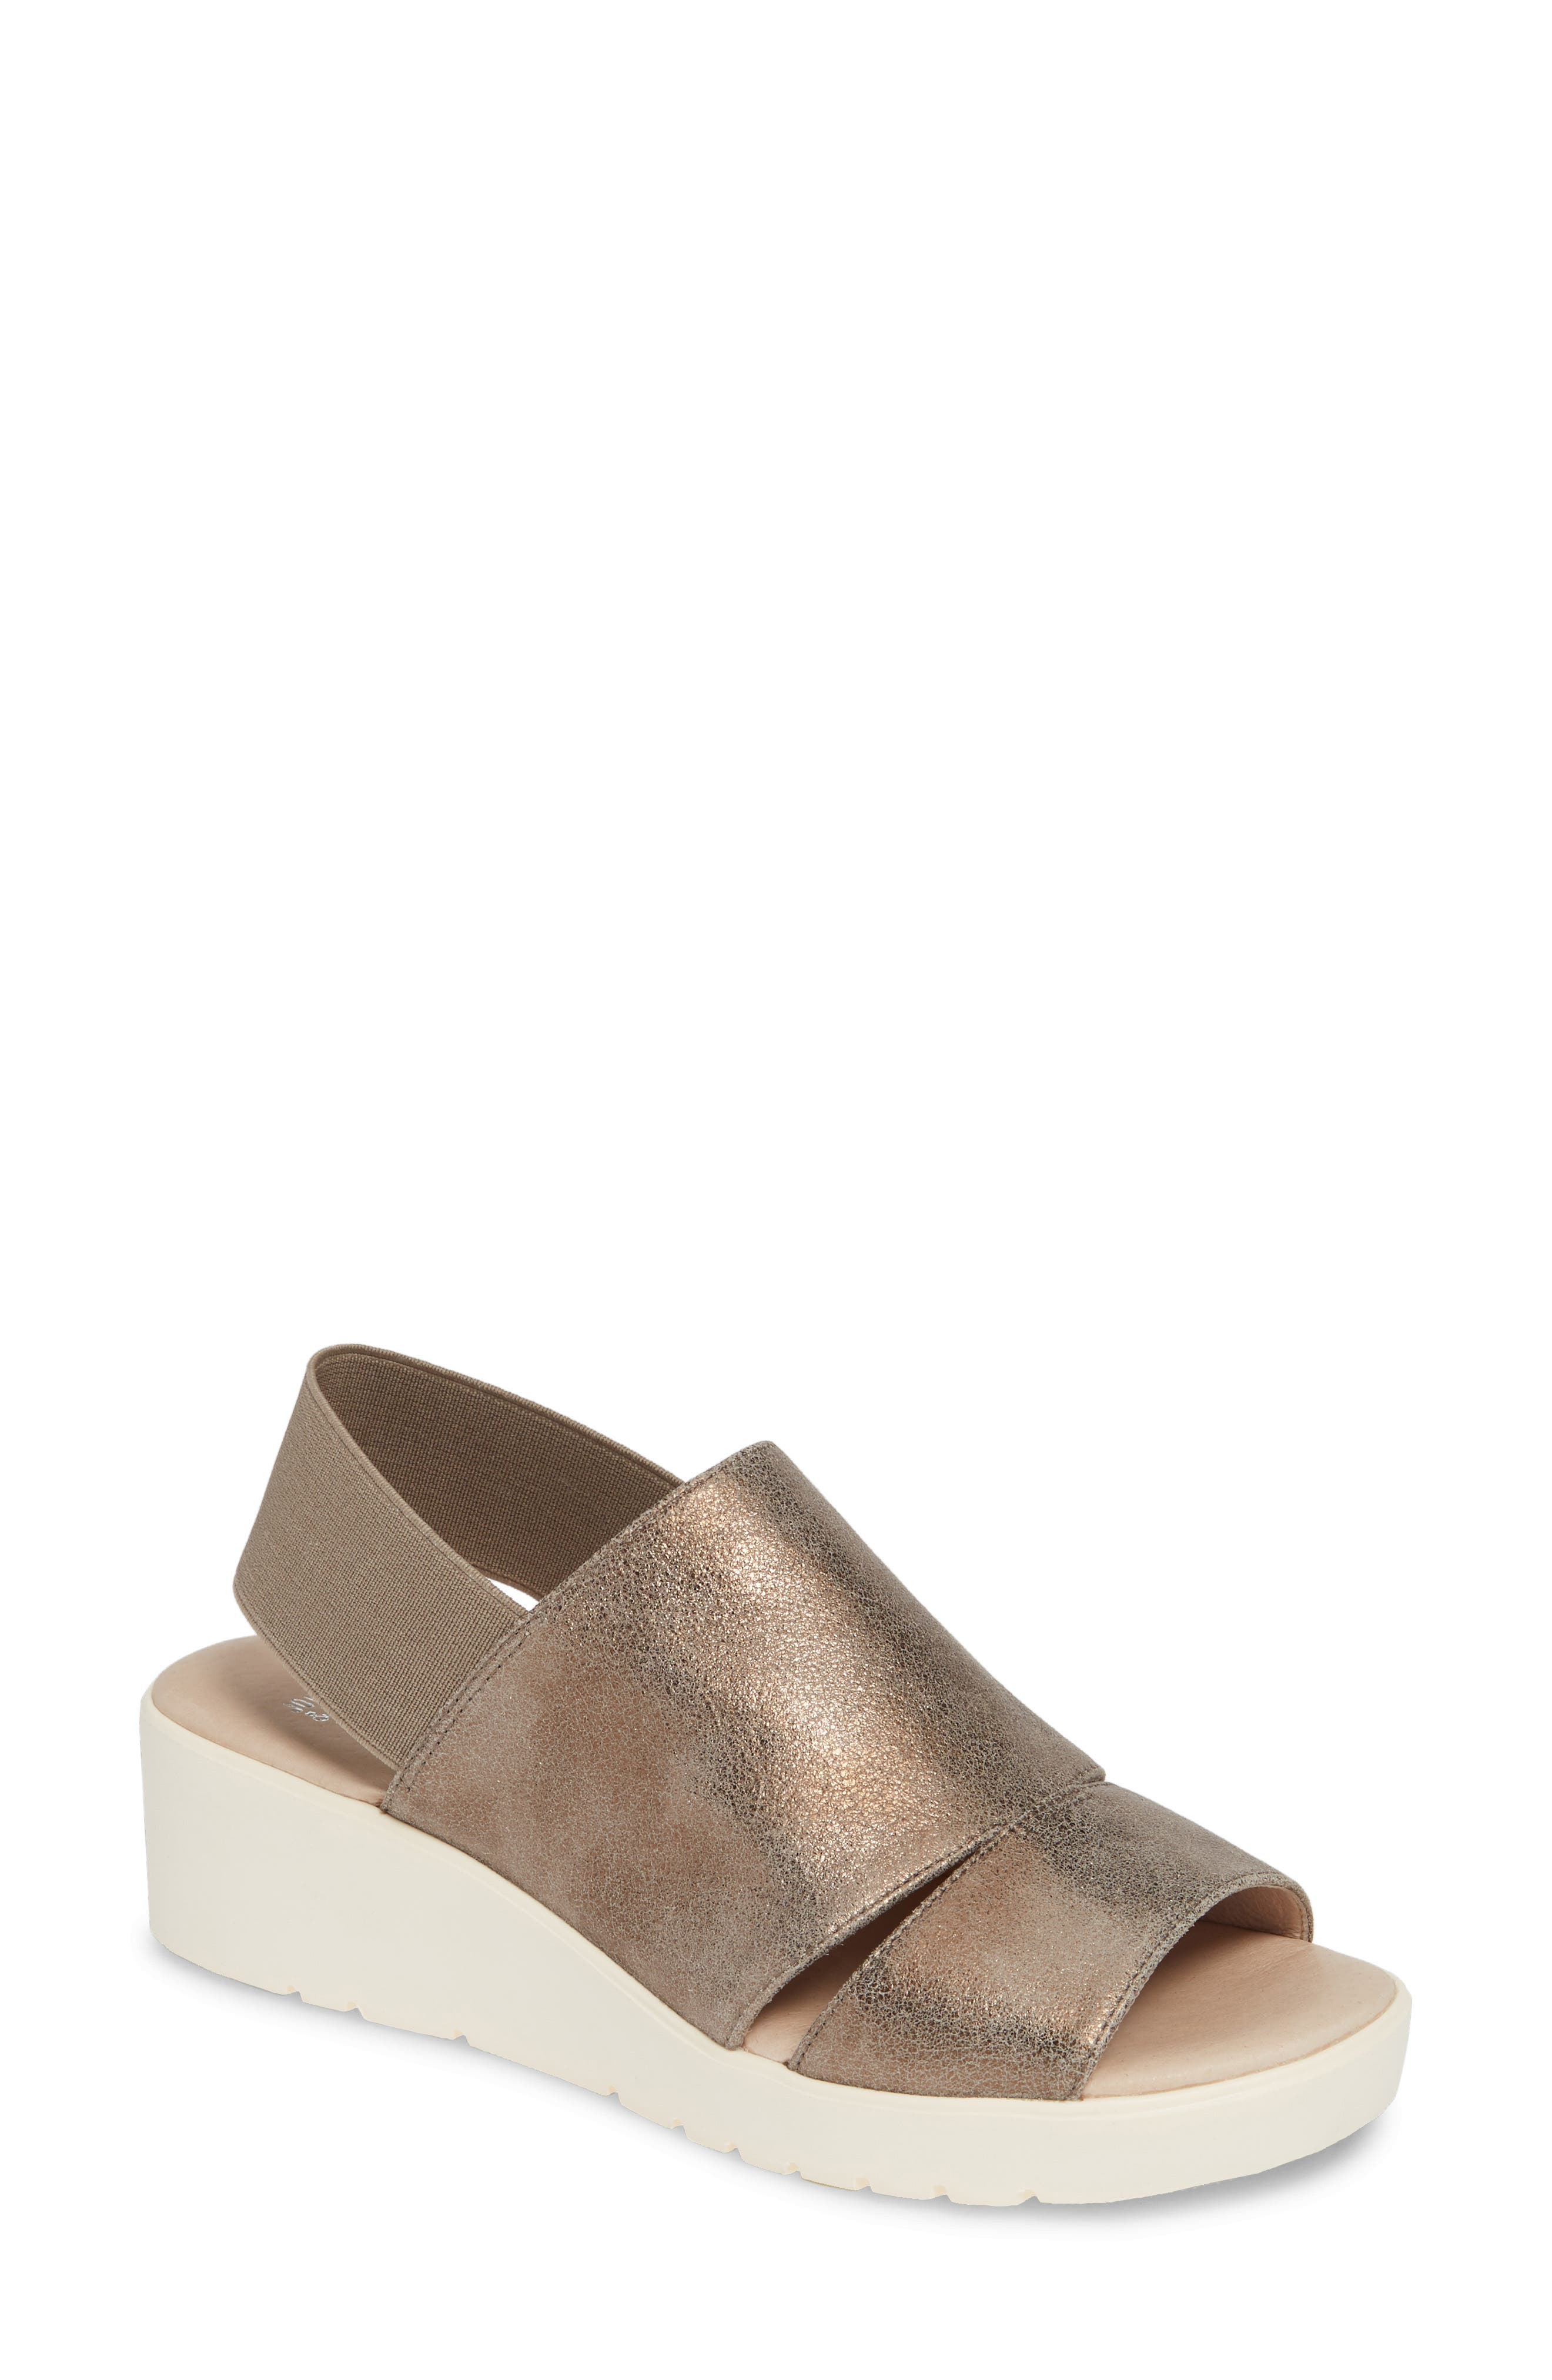 Johnston & Murphy Cassandra Slingback Platform Sandal, Metallic